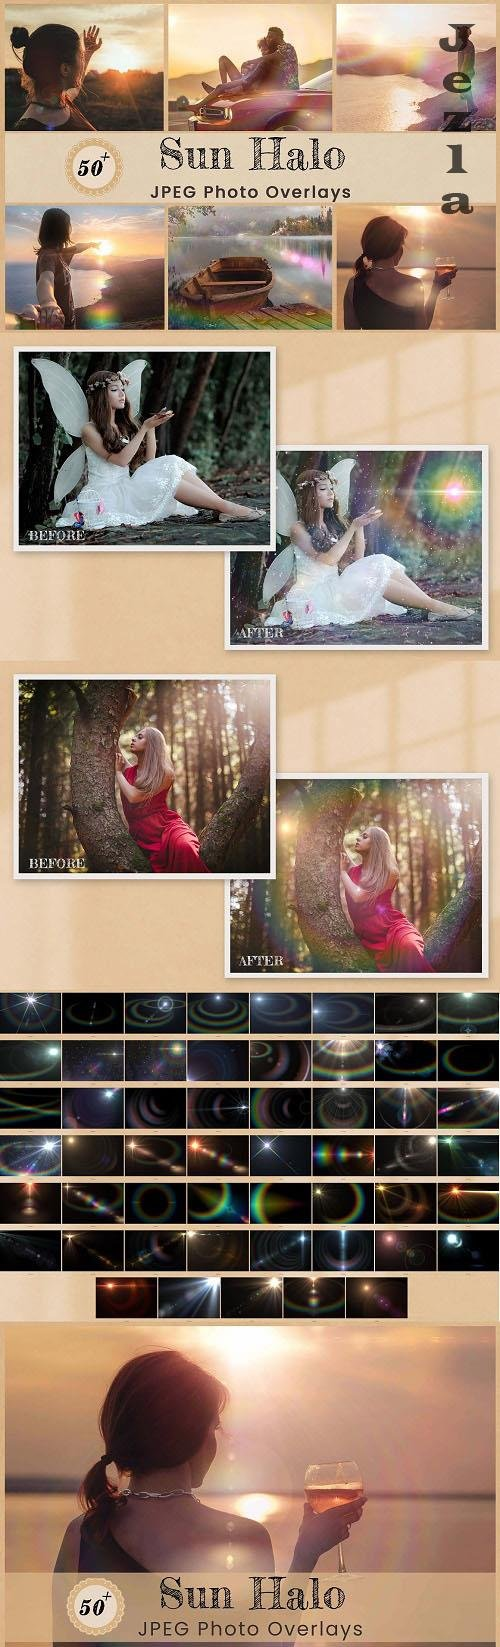 Sun Halo Photo Overlays Backdrops - 6456751